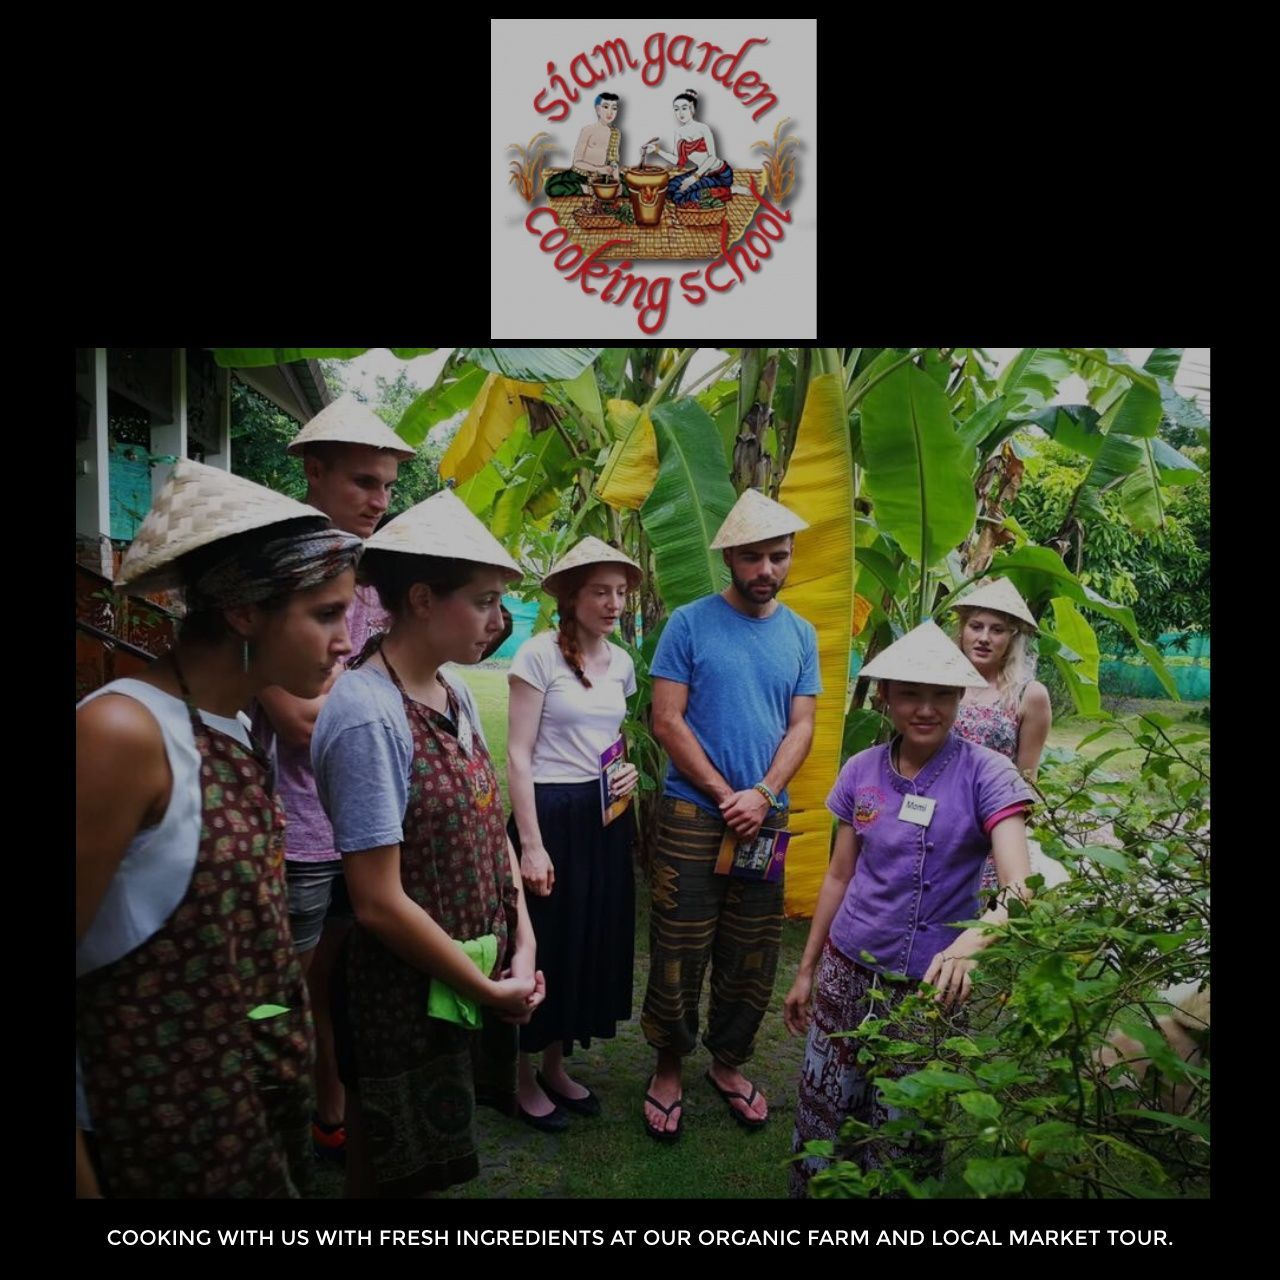 Siam Garden Cooking School logo